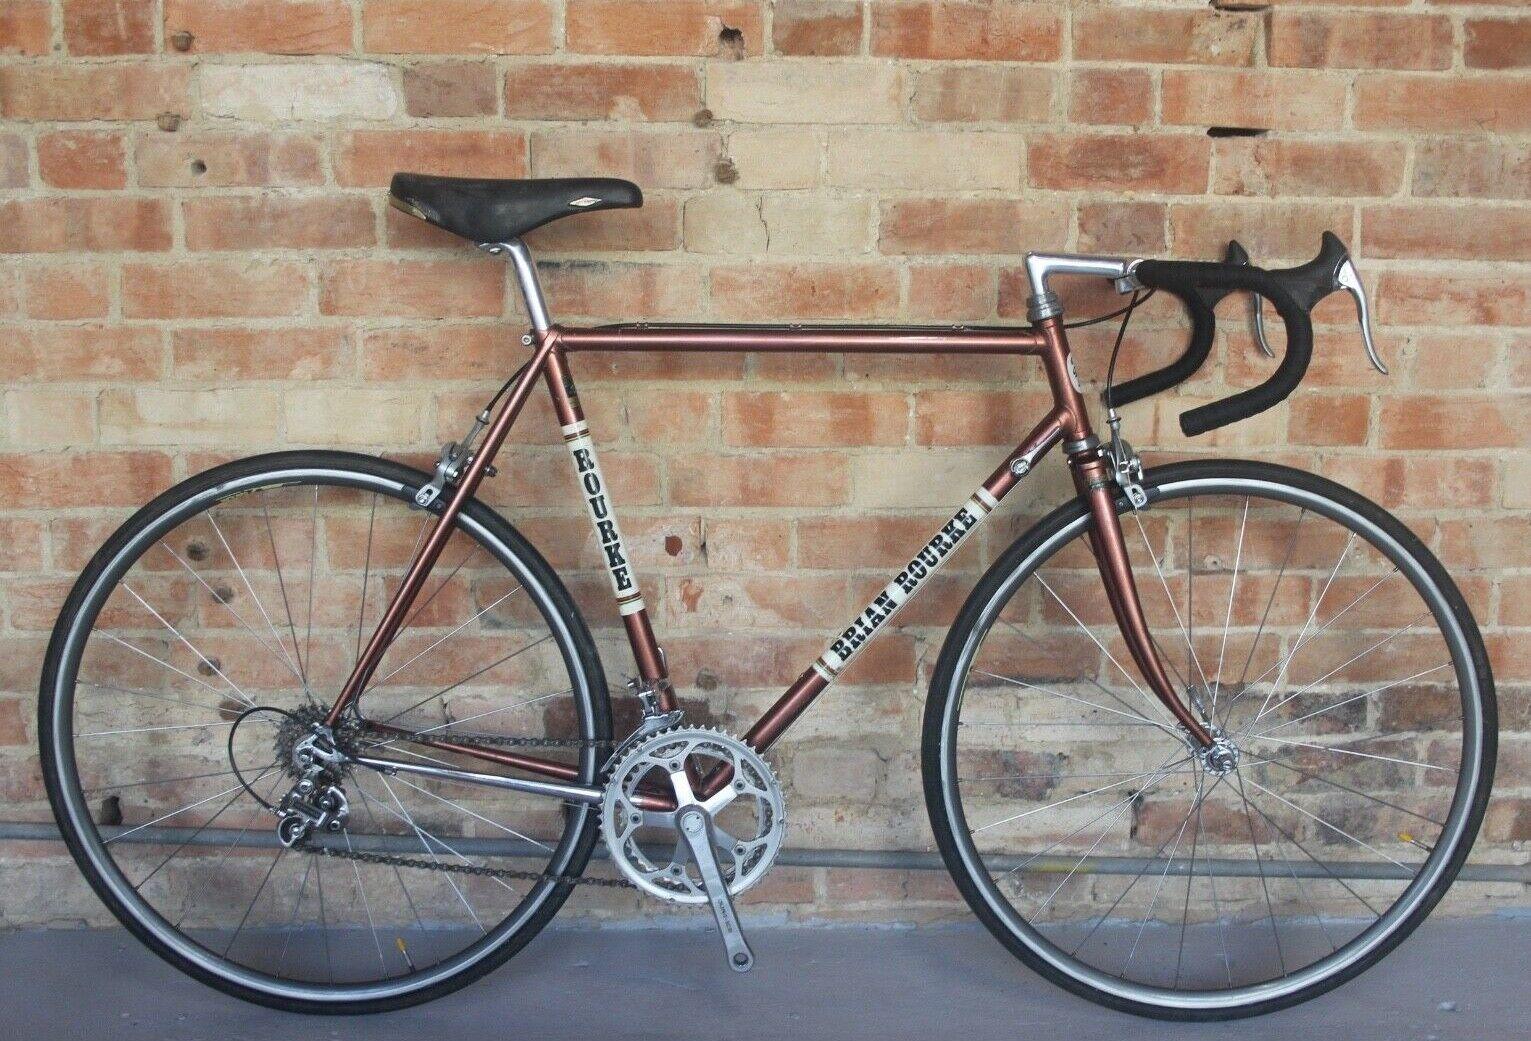 Vintage Brian Rourke 56cm Road Bike Reynolds 531 Shimano Dura Ace Retro Eroica